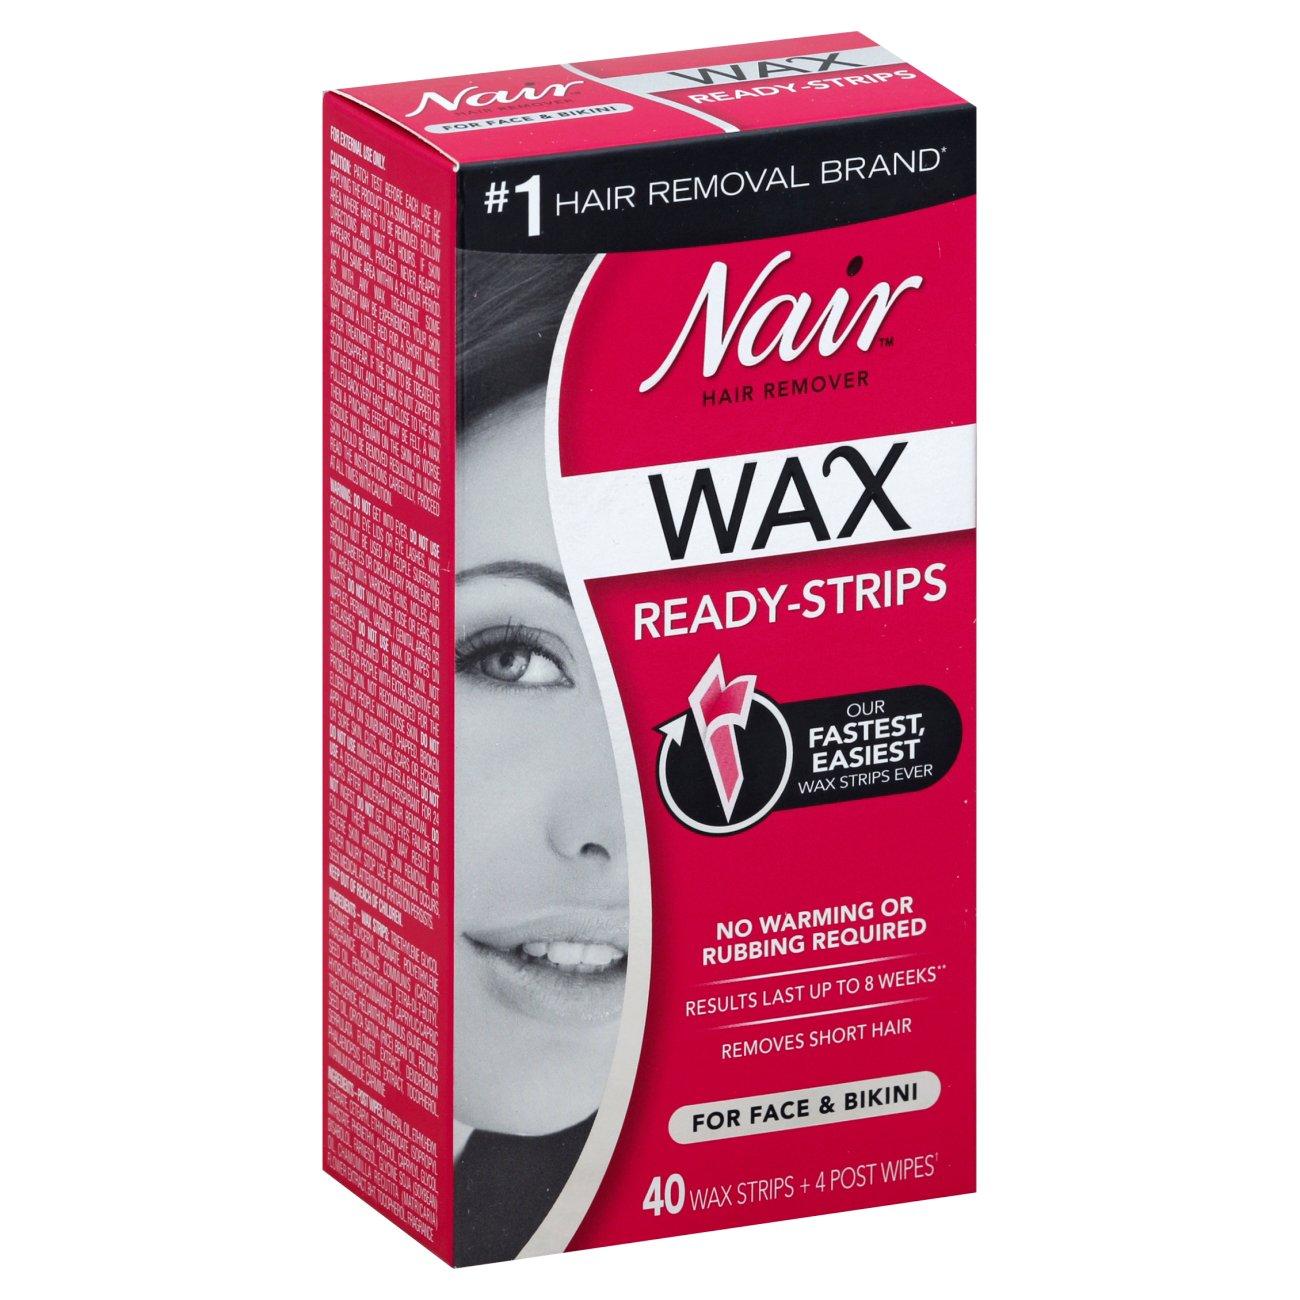 Nair Wax Ready Strips Face Shop Depilatories Wax At H E B